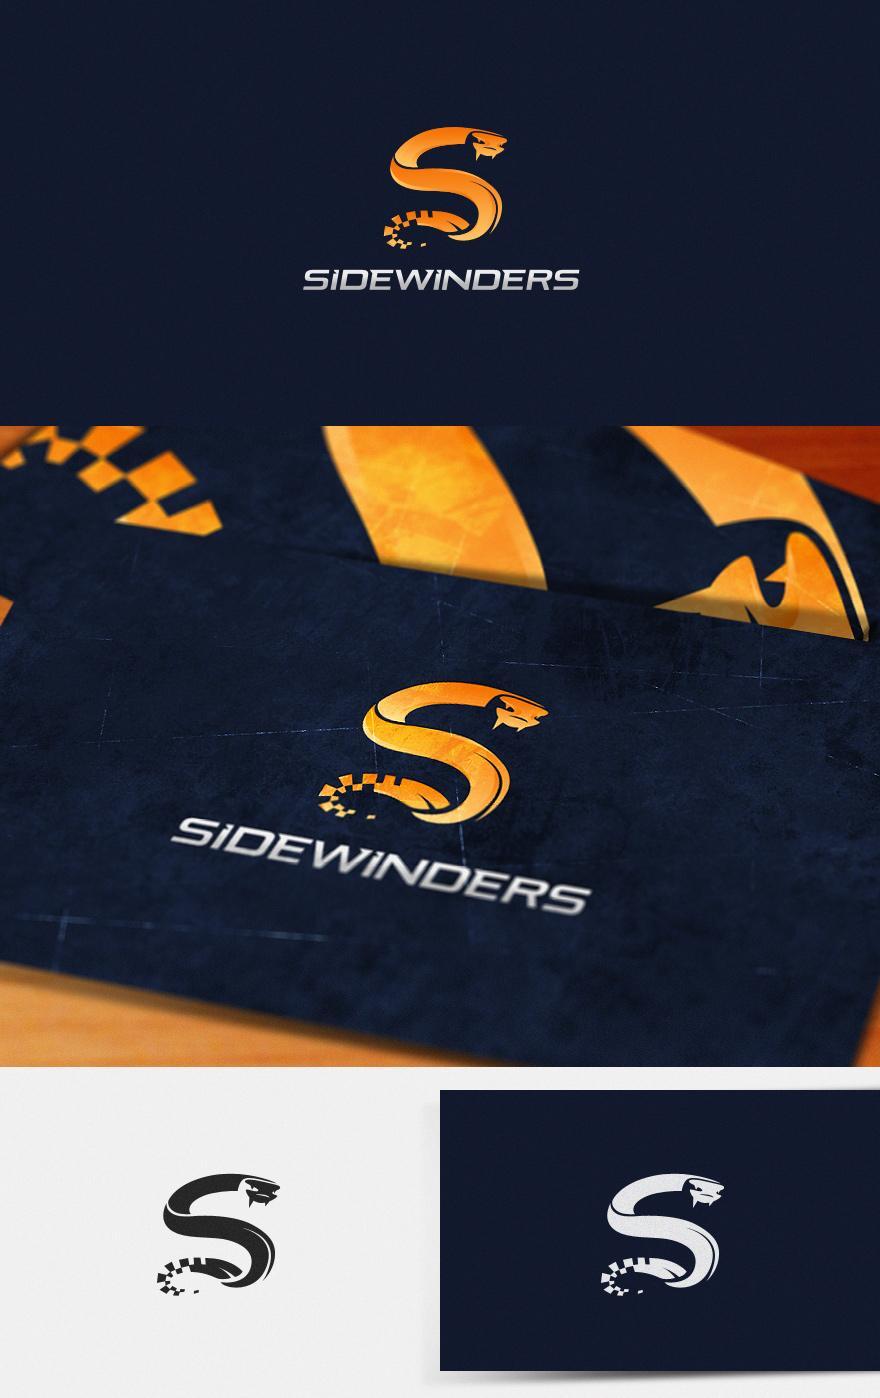 Sidewinders - Logos - Creattica